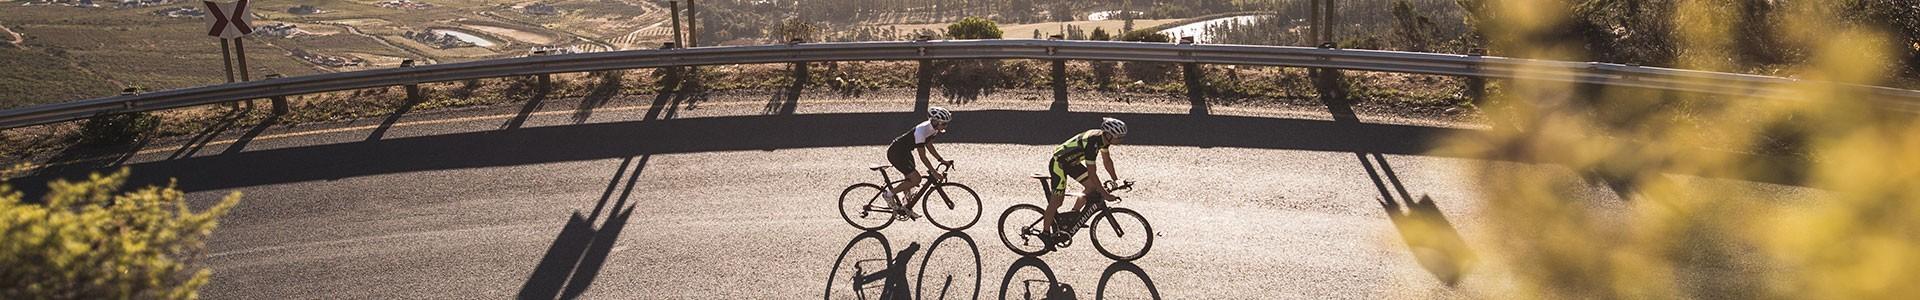 Fahrrad Accessoires namhafter Fahrradmarken | Top Qualität | günstig